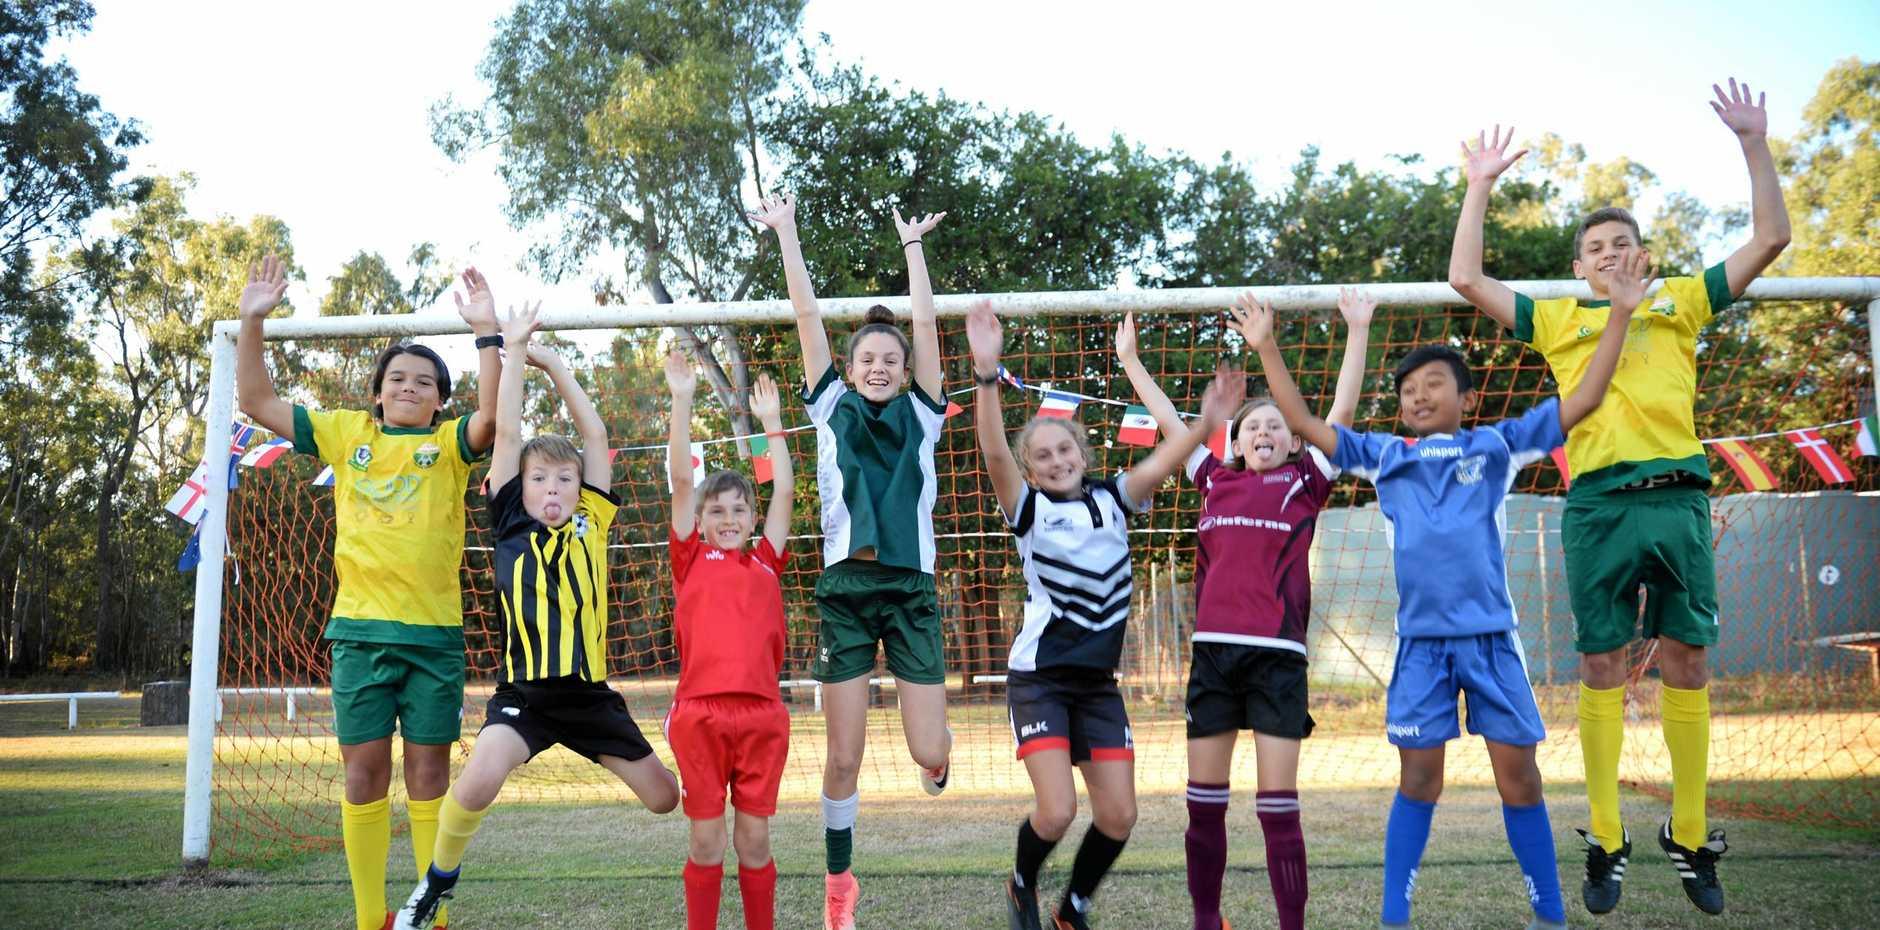 GO BOYS! Rockhampton footballers Tana Martin, Nate Neilsen, Riley Clarke, Miia Anderson, Isbella Blomfield, Aniesa Law, Sonam Lama and Jardel Bob are ready to cheer on the Socceroos in the 2018 FIFA World Cup.